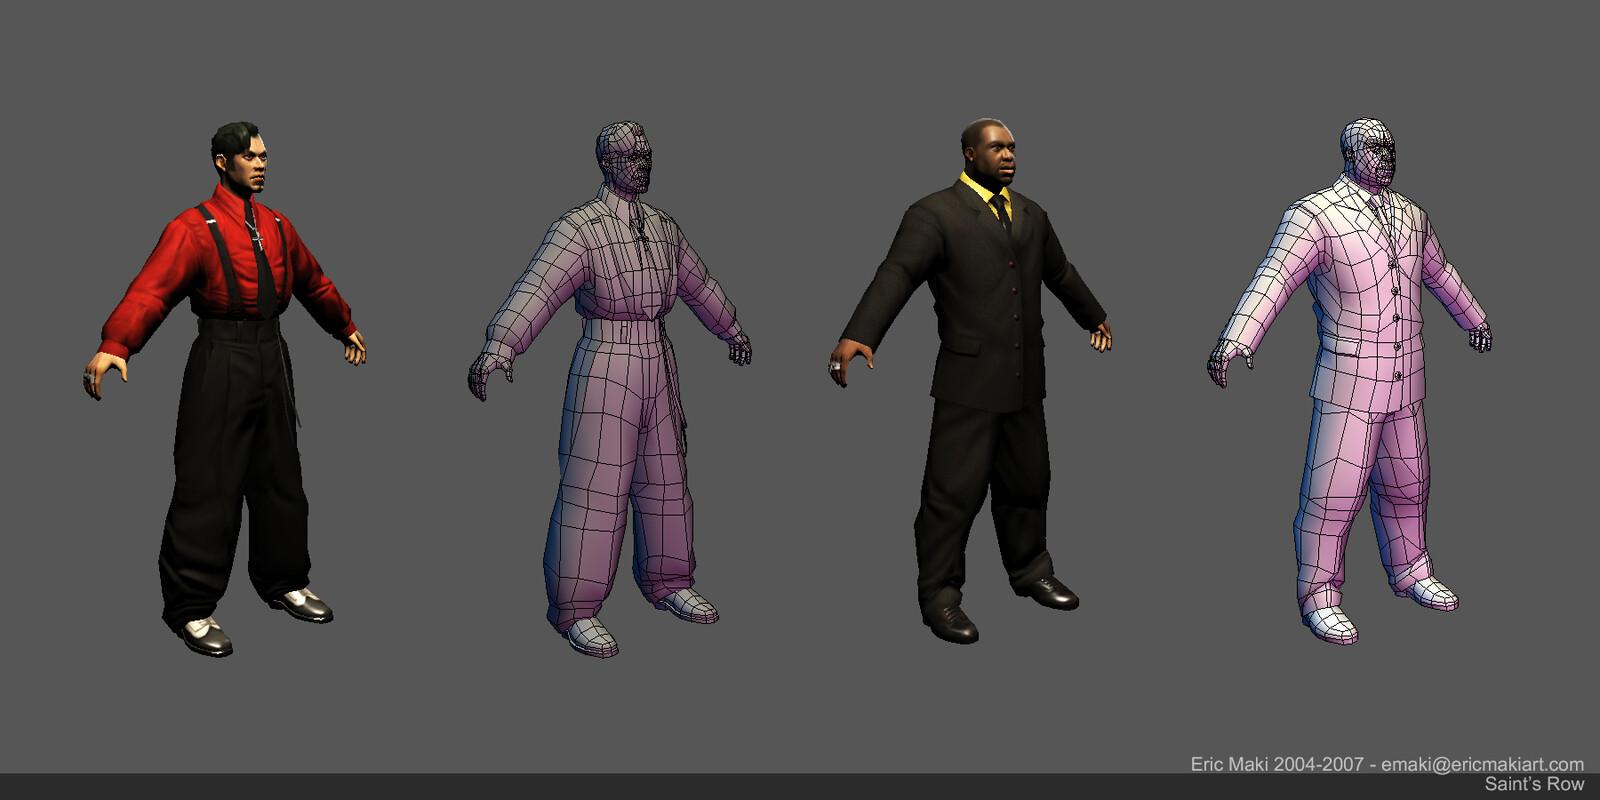 Saint's Row Story Characters